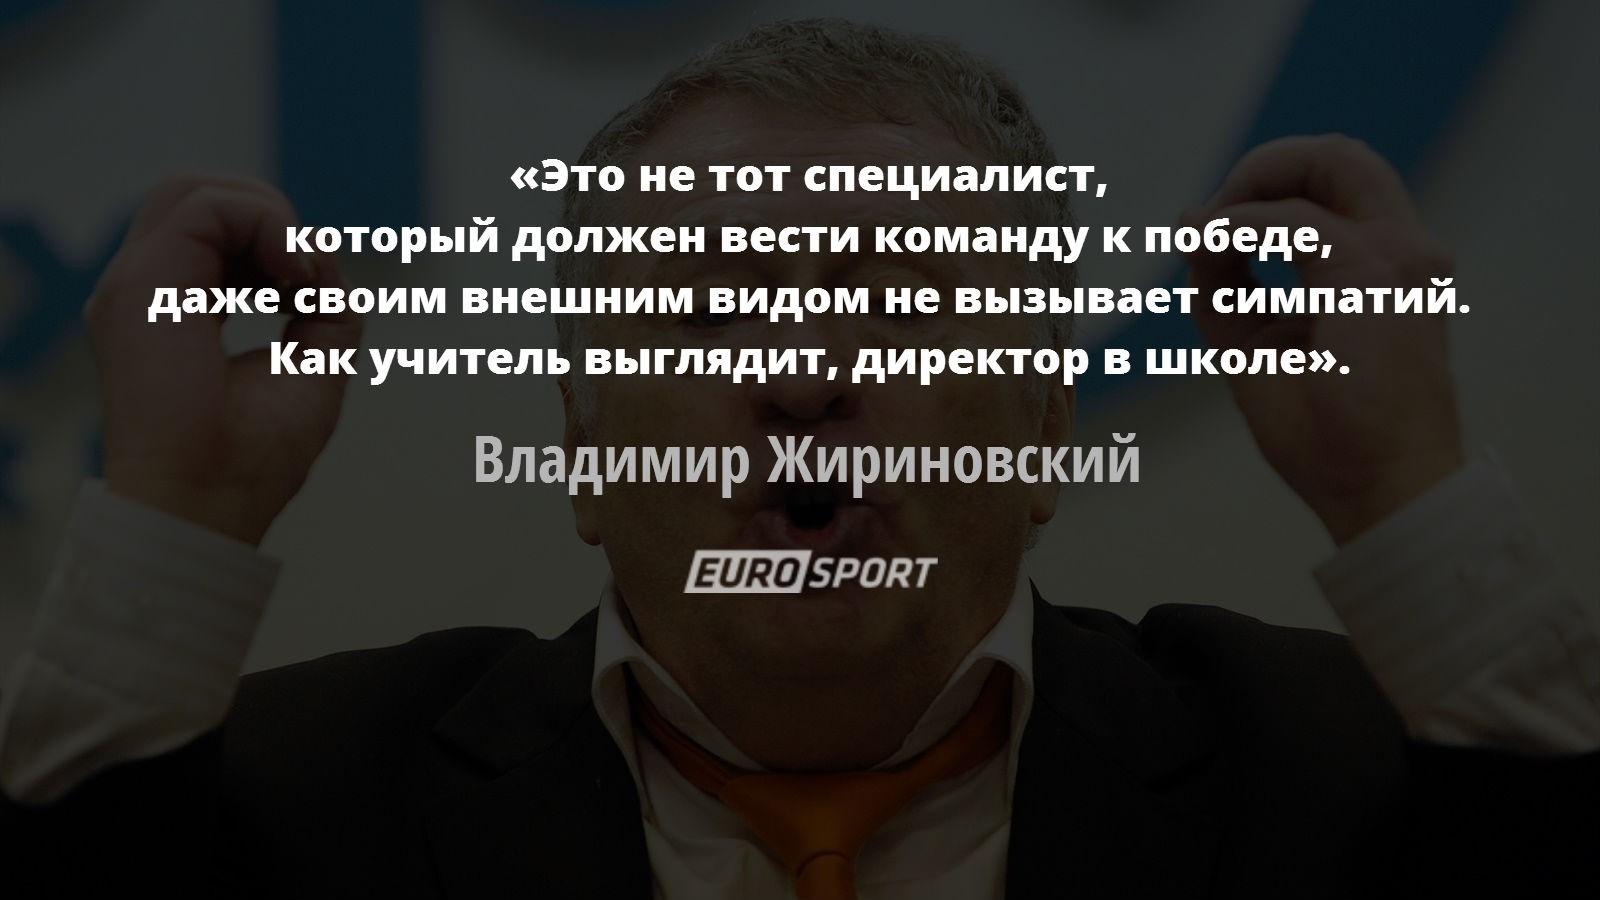 https://i.eurosport.com/2015/07/13/1639210.jpg